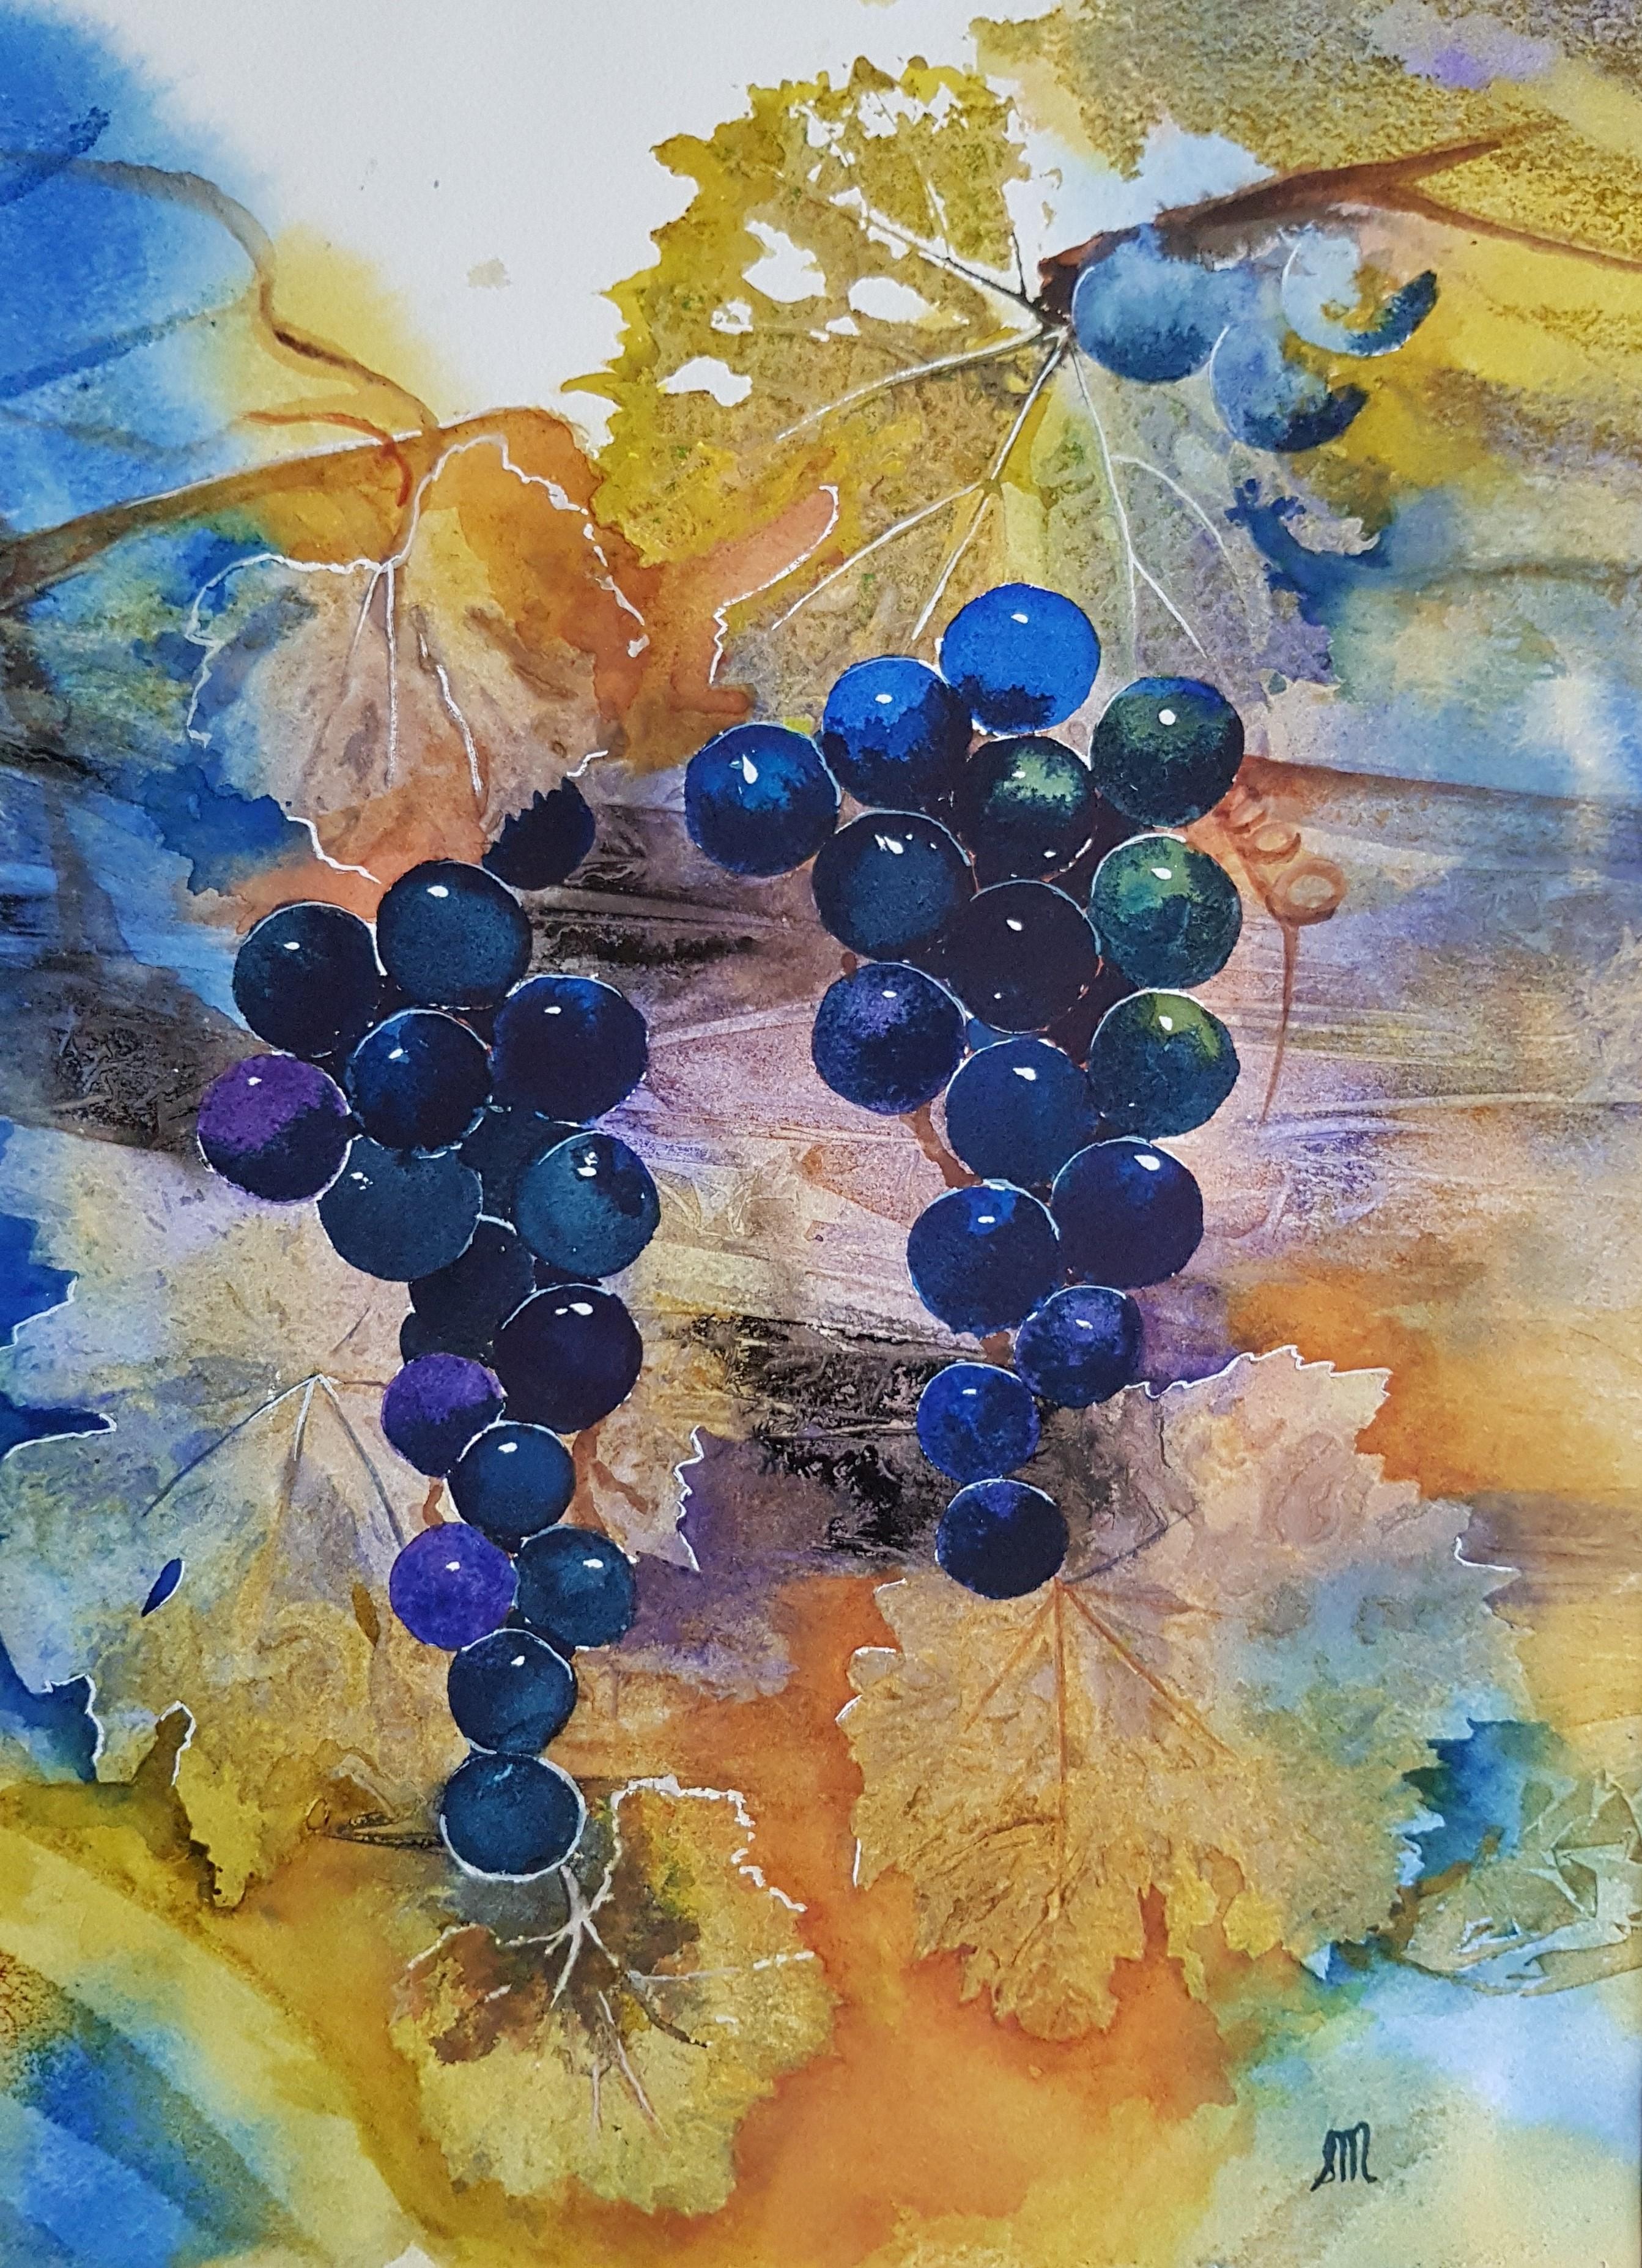 Vineyard Black Grapes-Mix Media